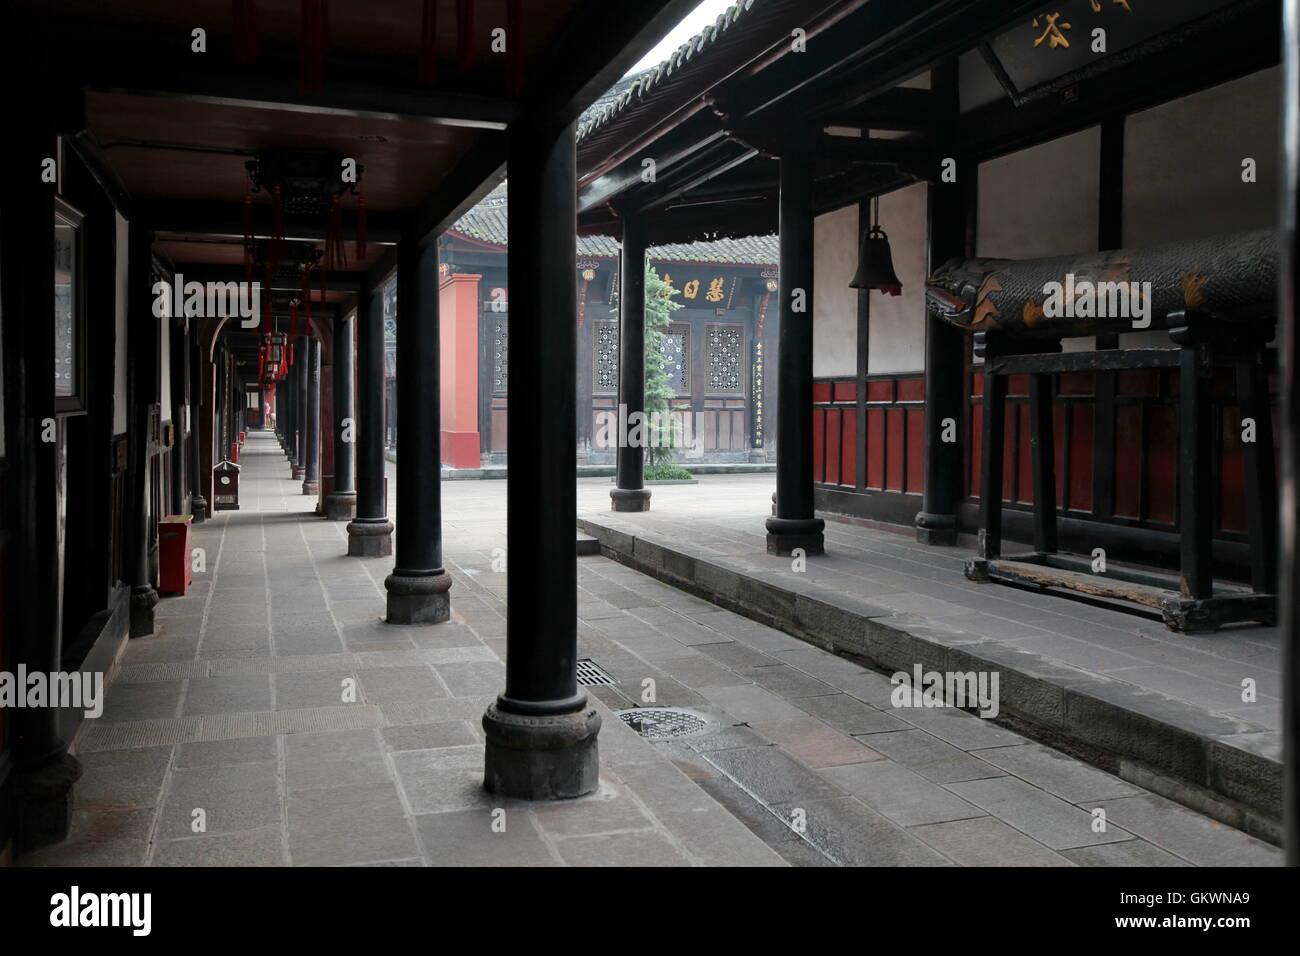 China, Beijing, Lama Temple - Stock Image